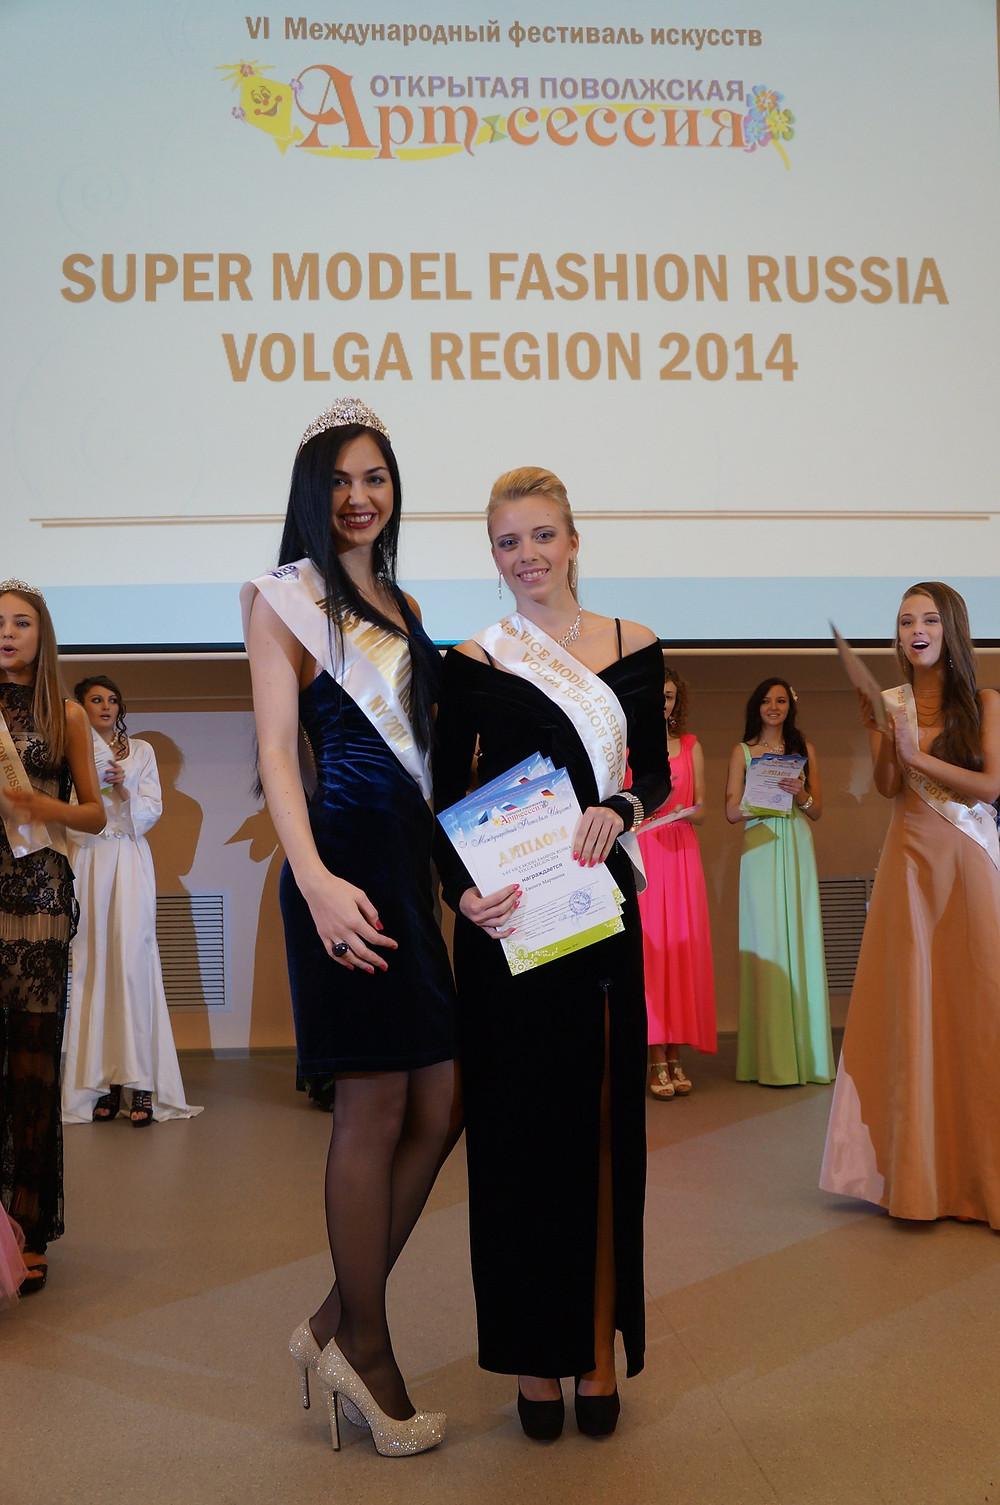 Марианна Евонен - 1-st Vice Model Fashion Russia Volga Region 2014